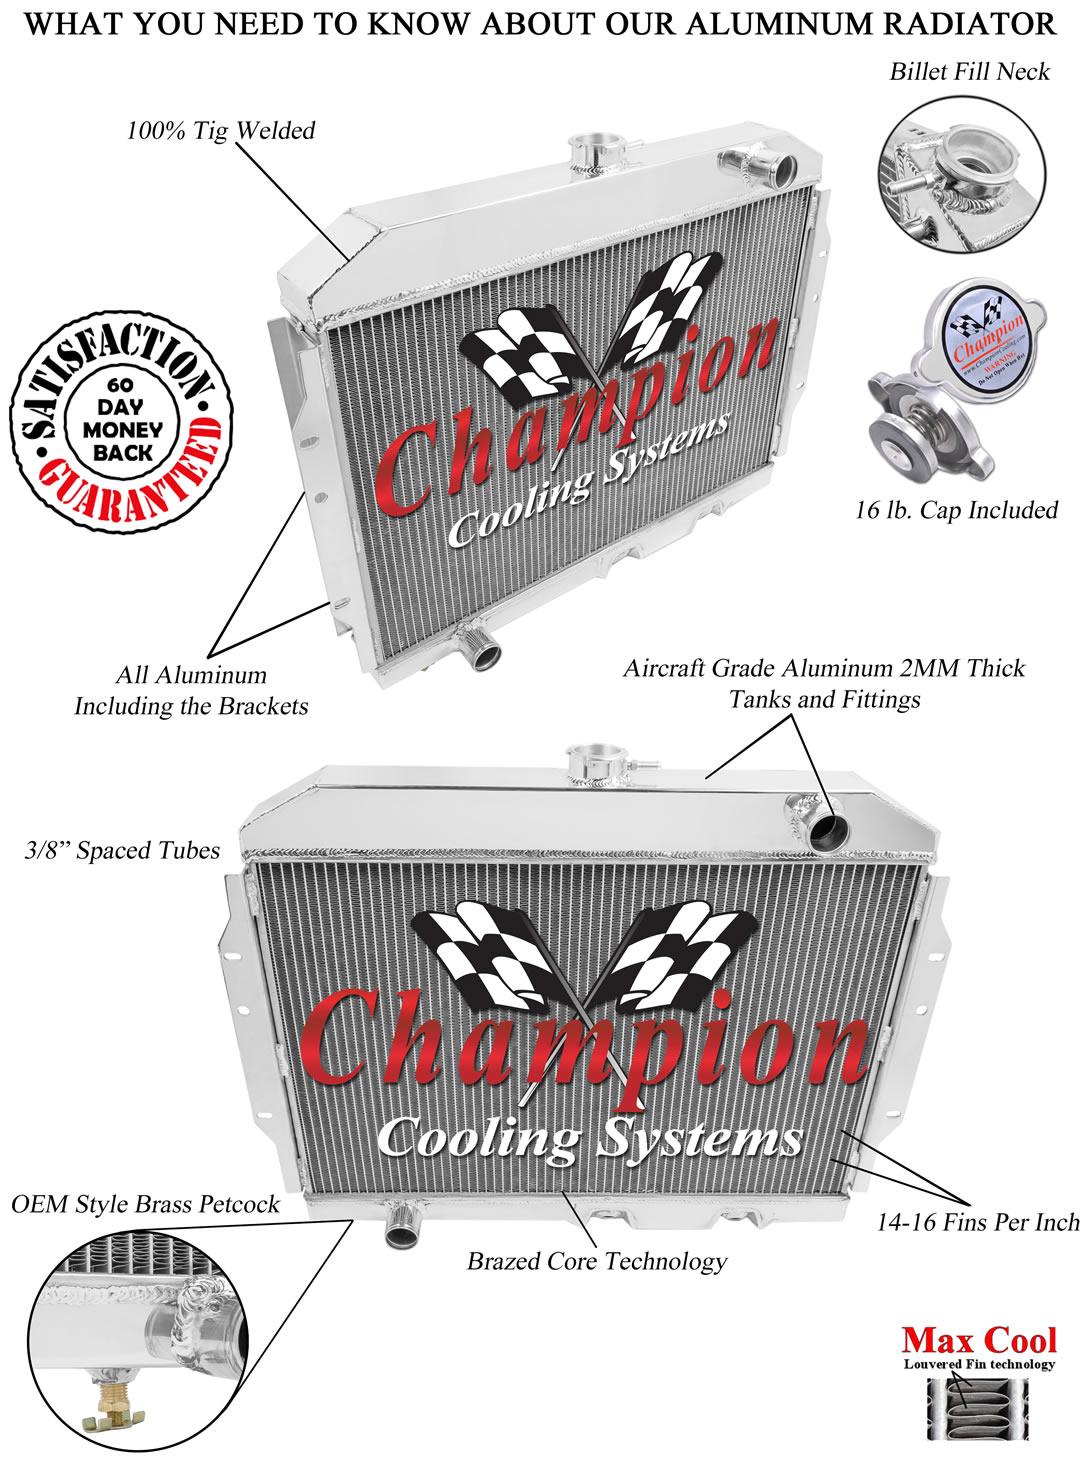 1960-1962 American Motors Rambler Aluminum 3 Row Champion Radiator